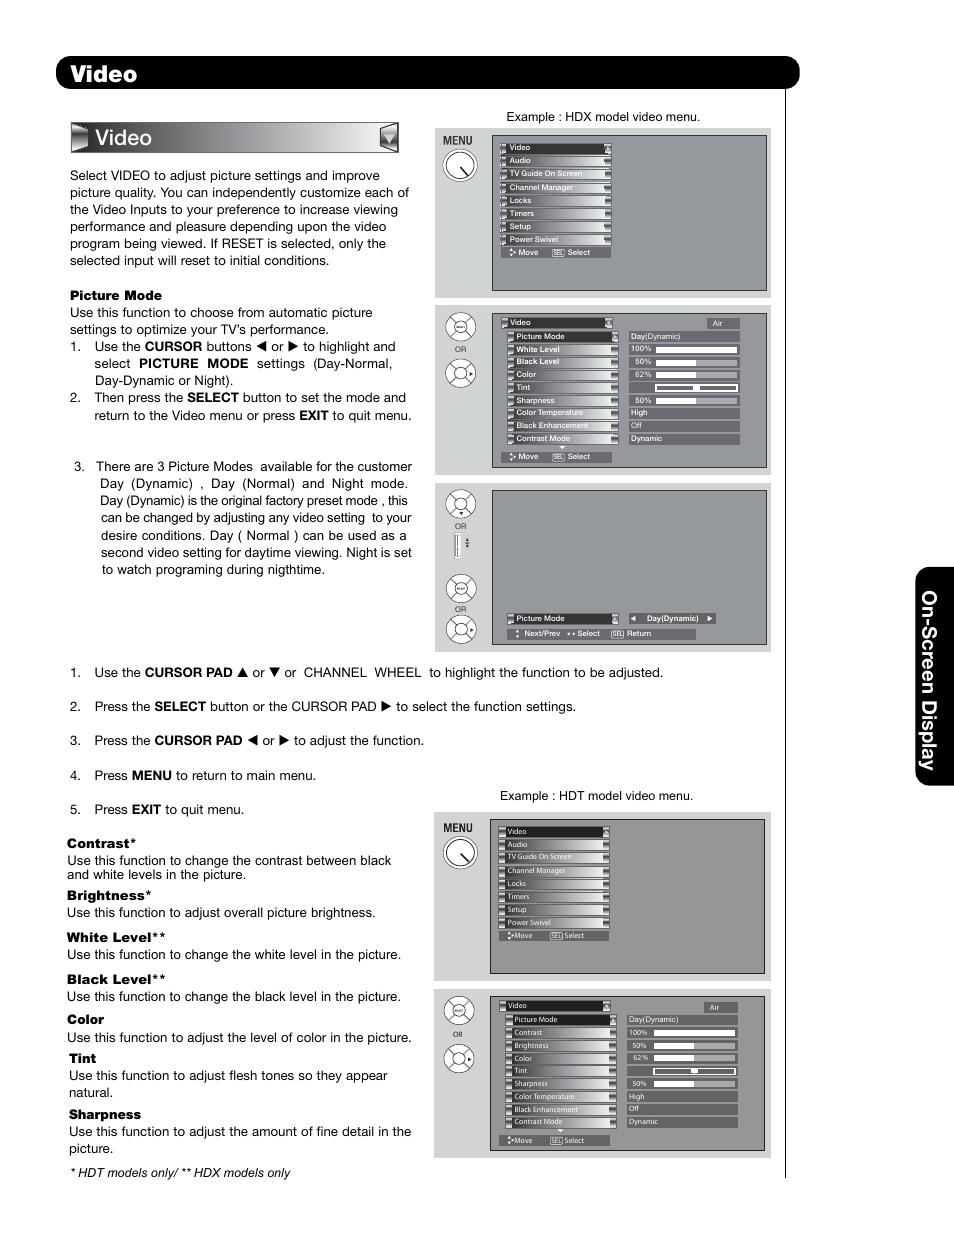 video on scr een display hitachi 55hdt79 user manual page 47 rh manualsdir com Hitachi 55HDX62 Model Hitachi 50VS69A TV Model